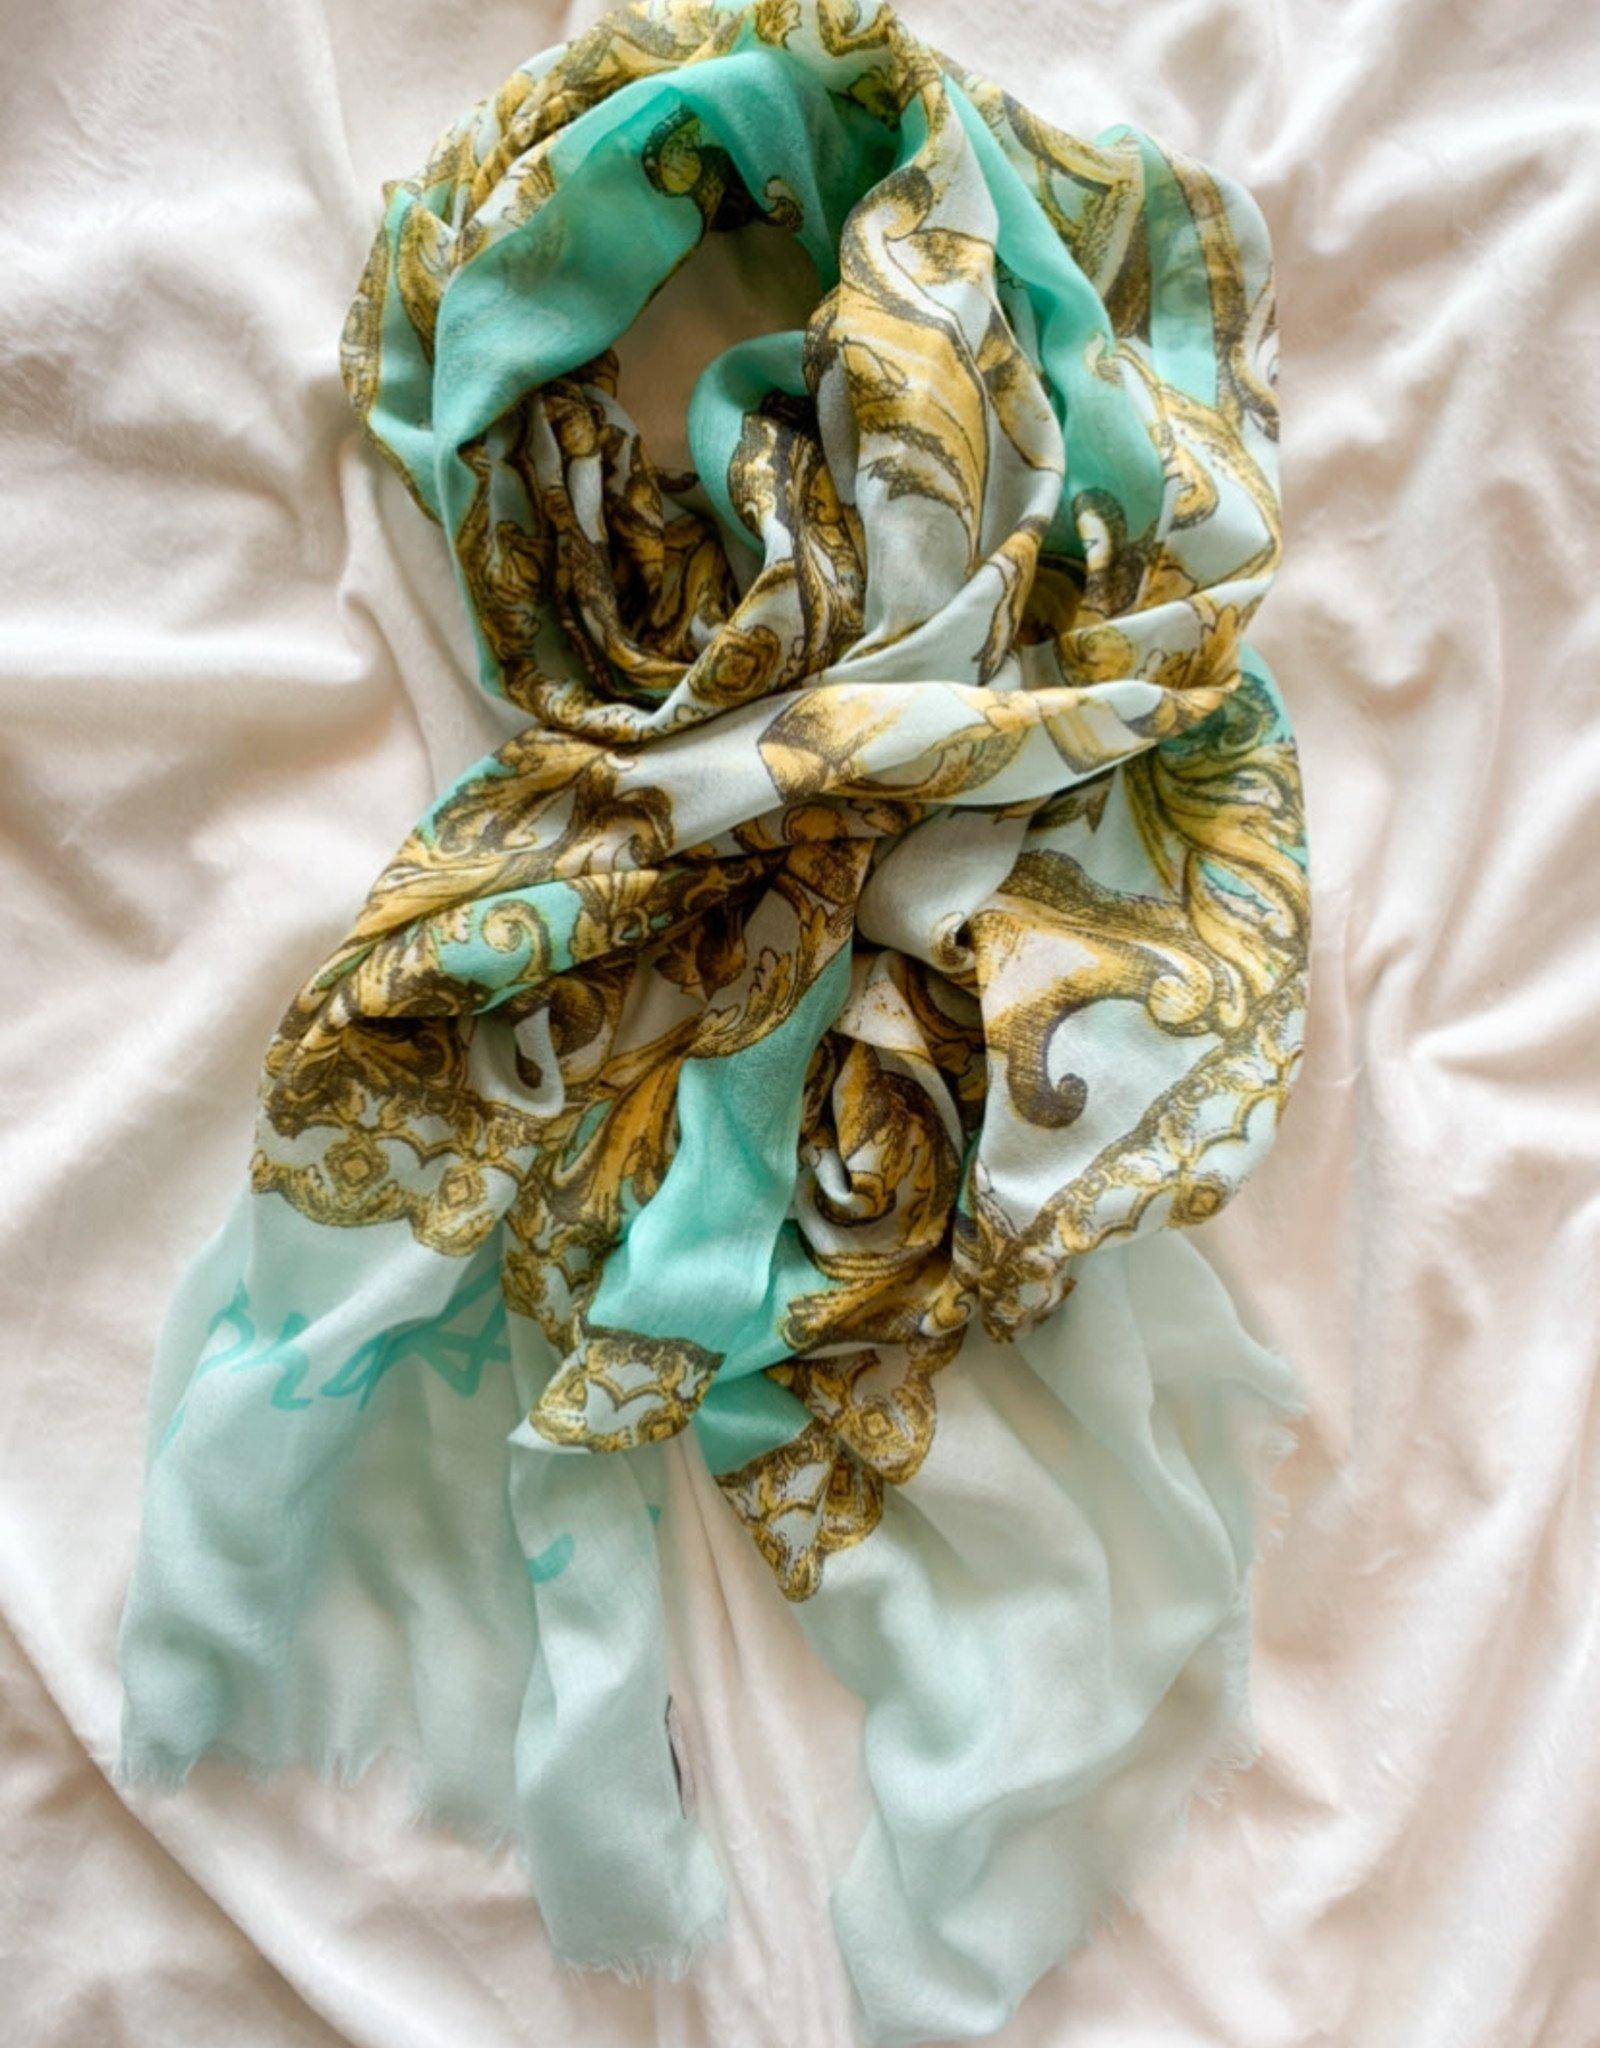 V.Fraas Fleur De Lis Lightweight Wool Scarf In Turquoise